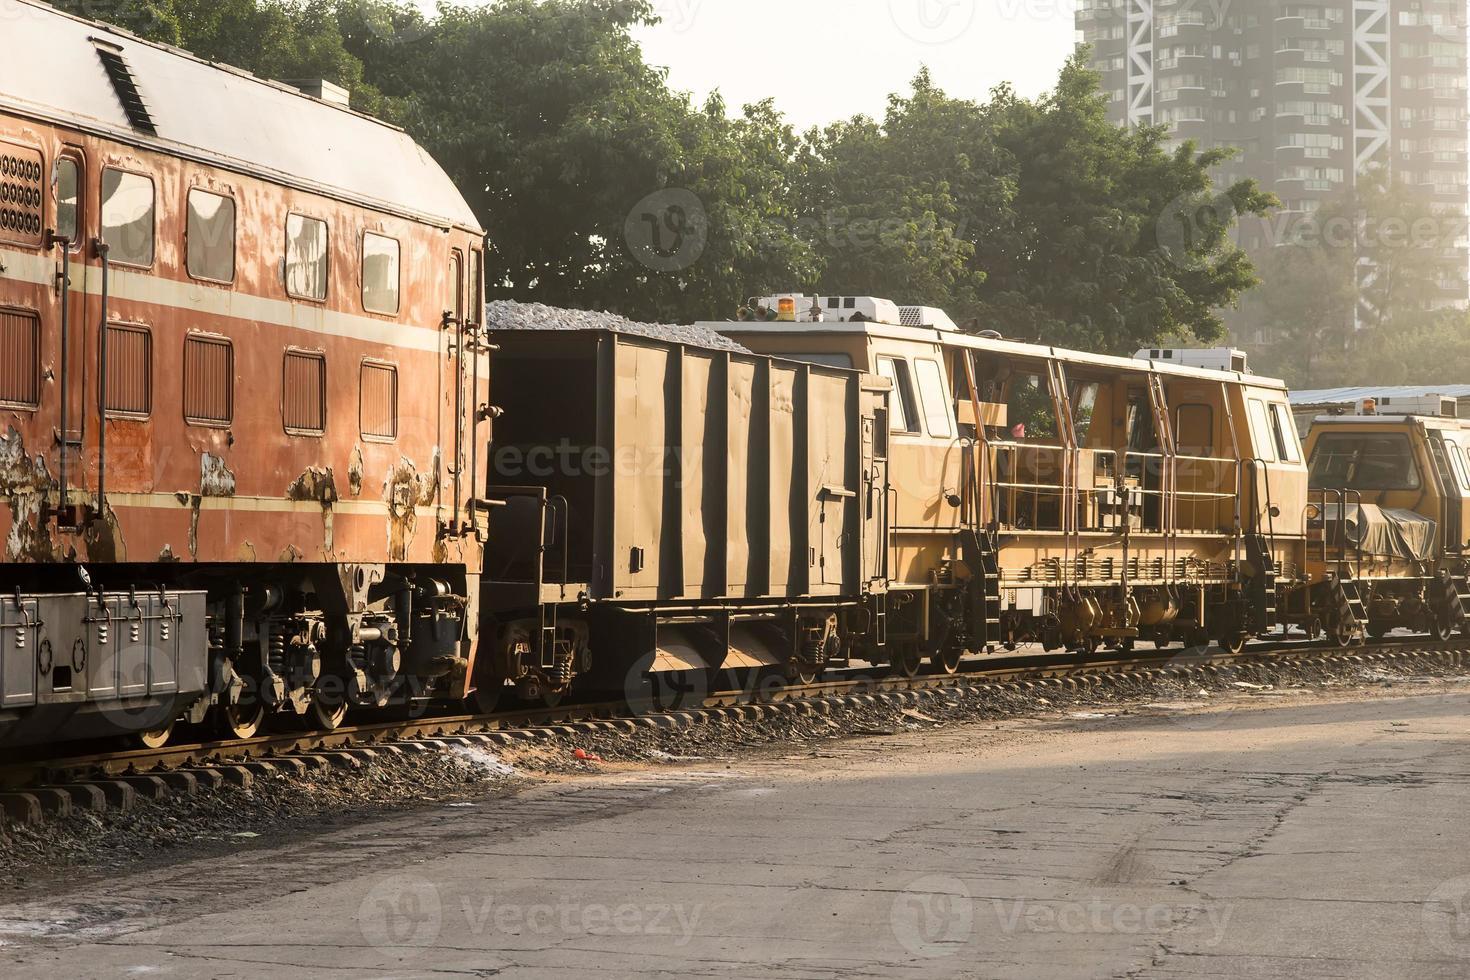 Eisenbahnwaggons foto